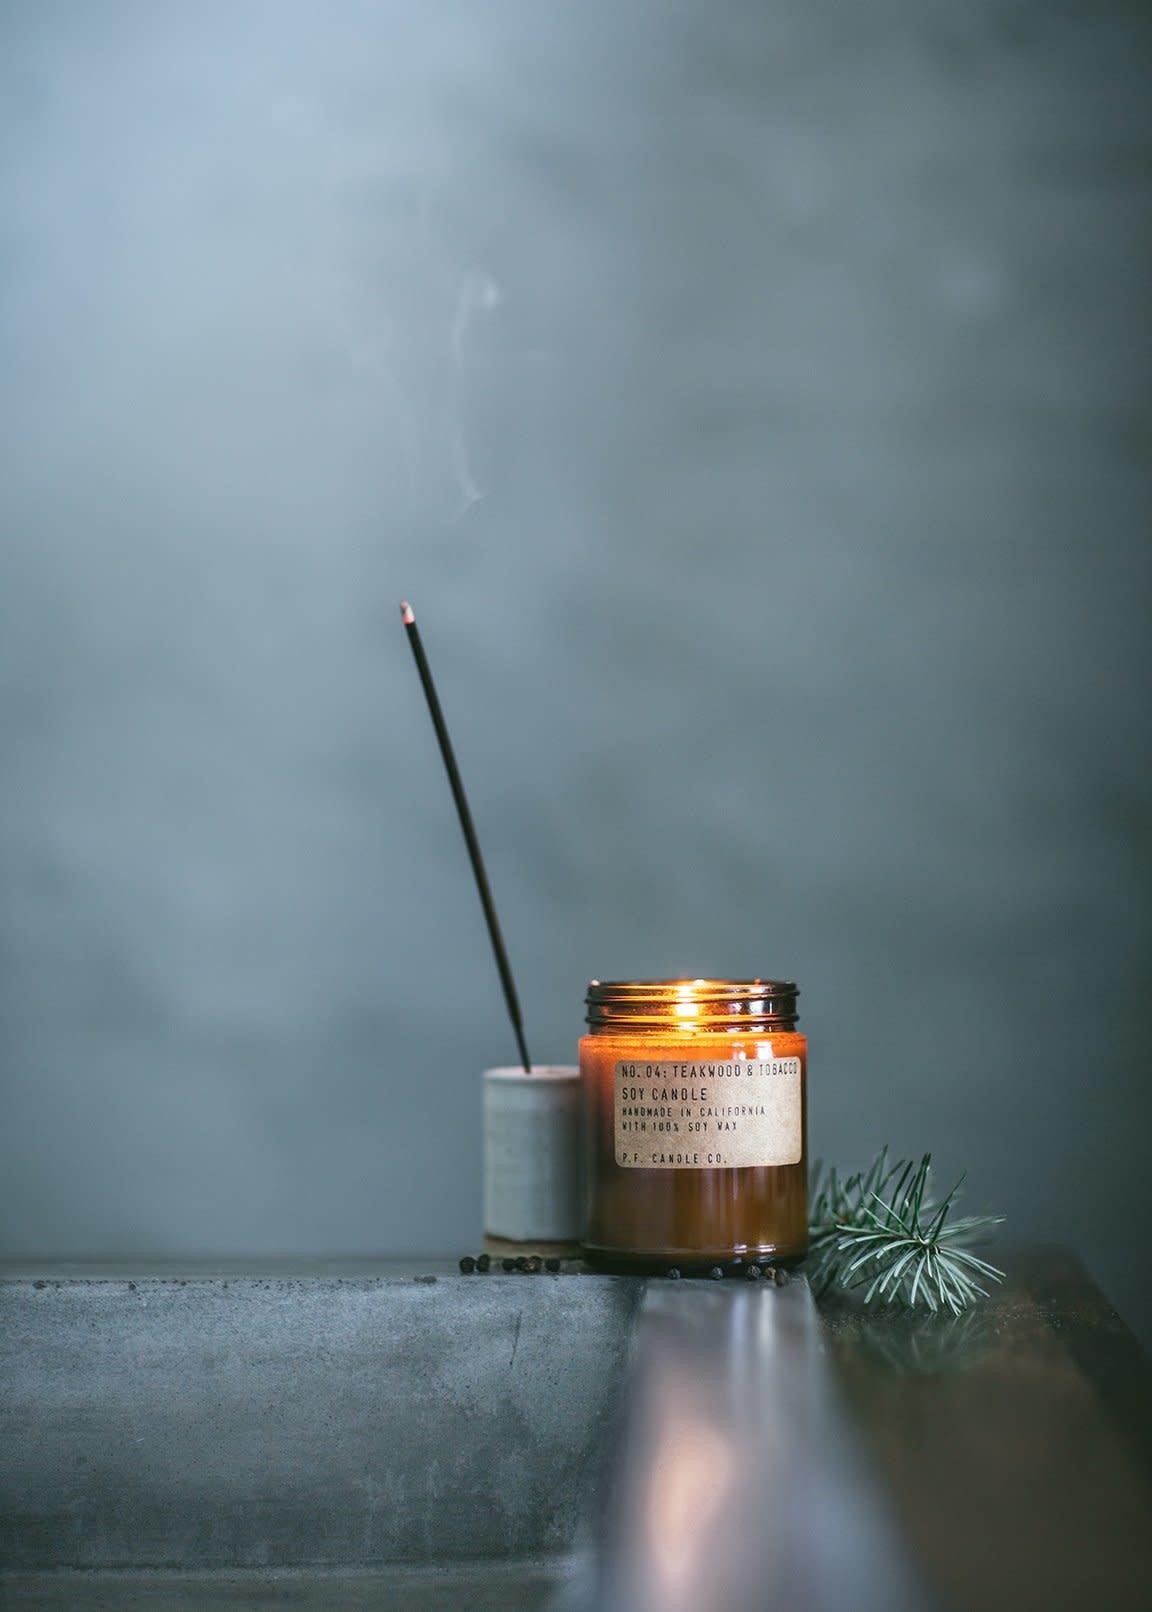 PF CANDLE CO teakwood & tobacco large candle